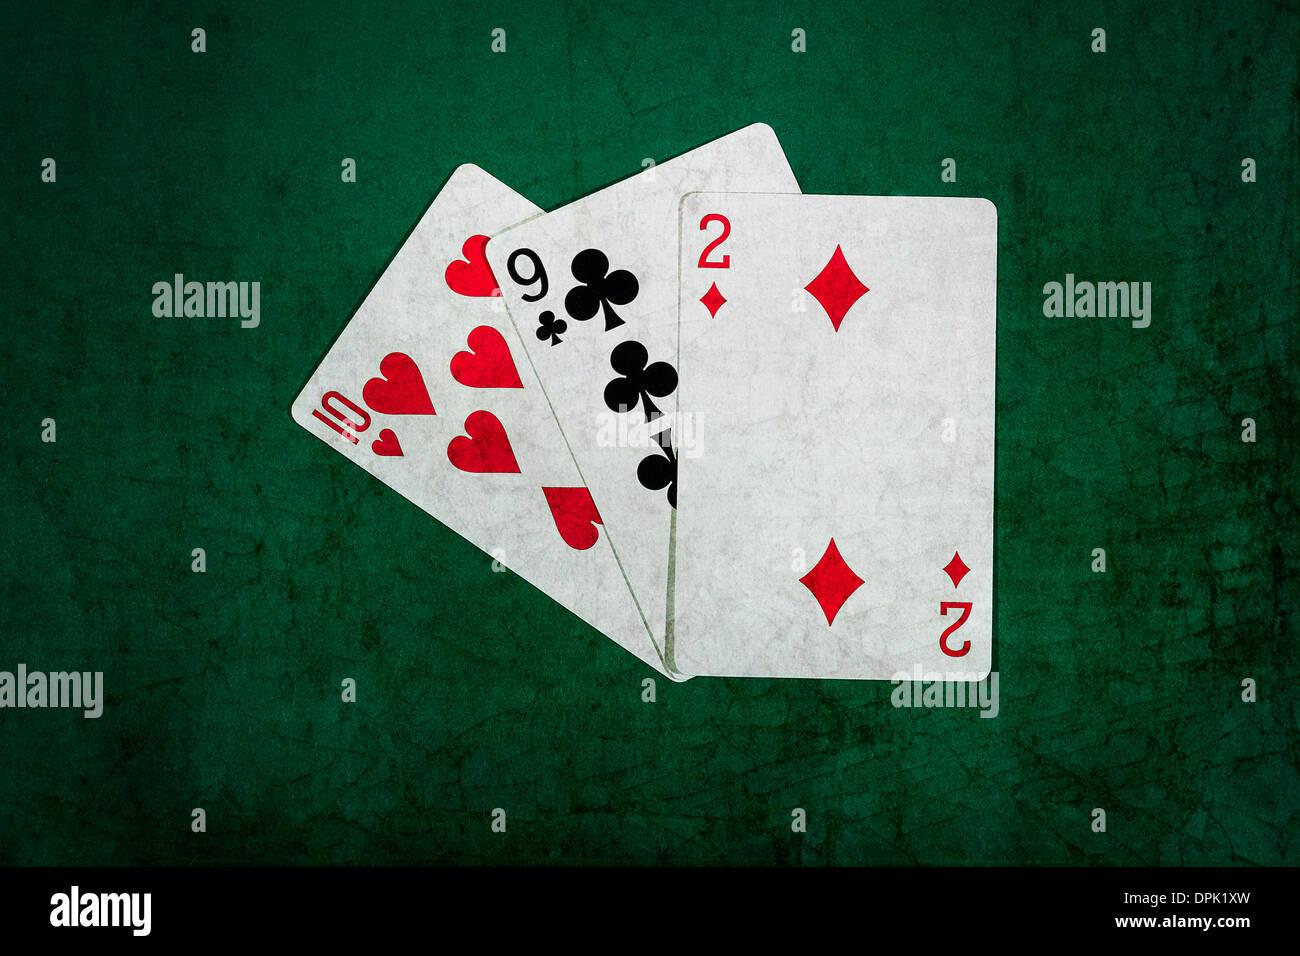 Blackjack Twenty One